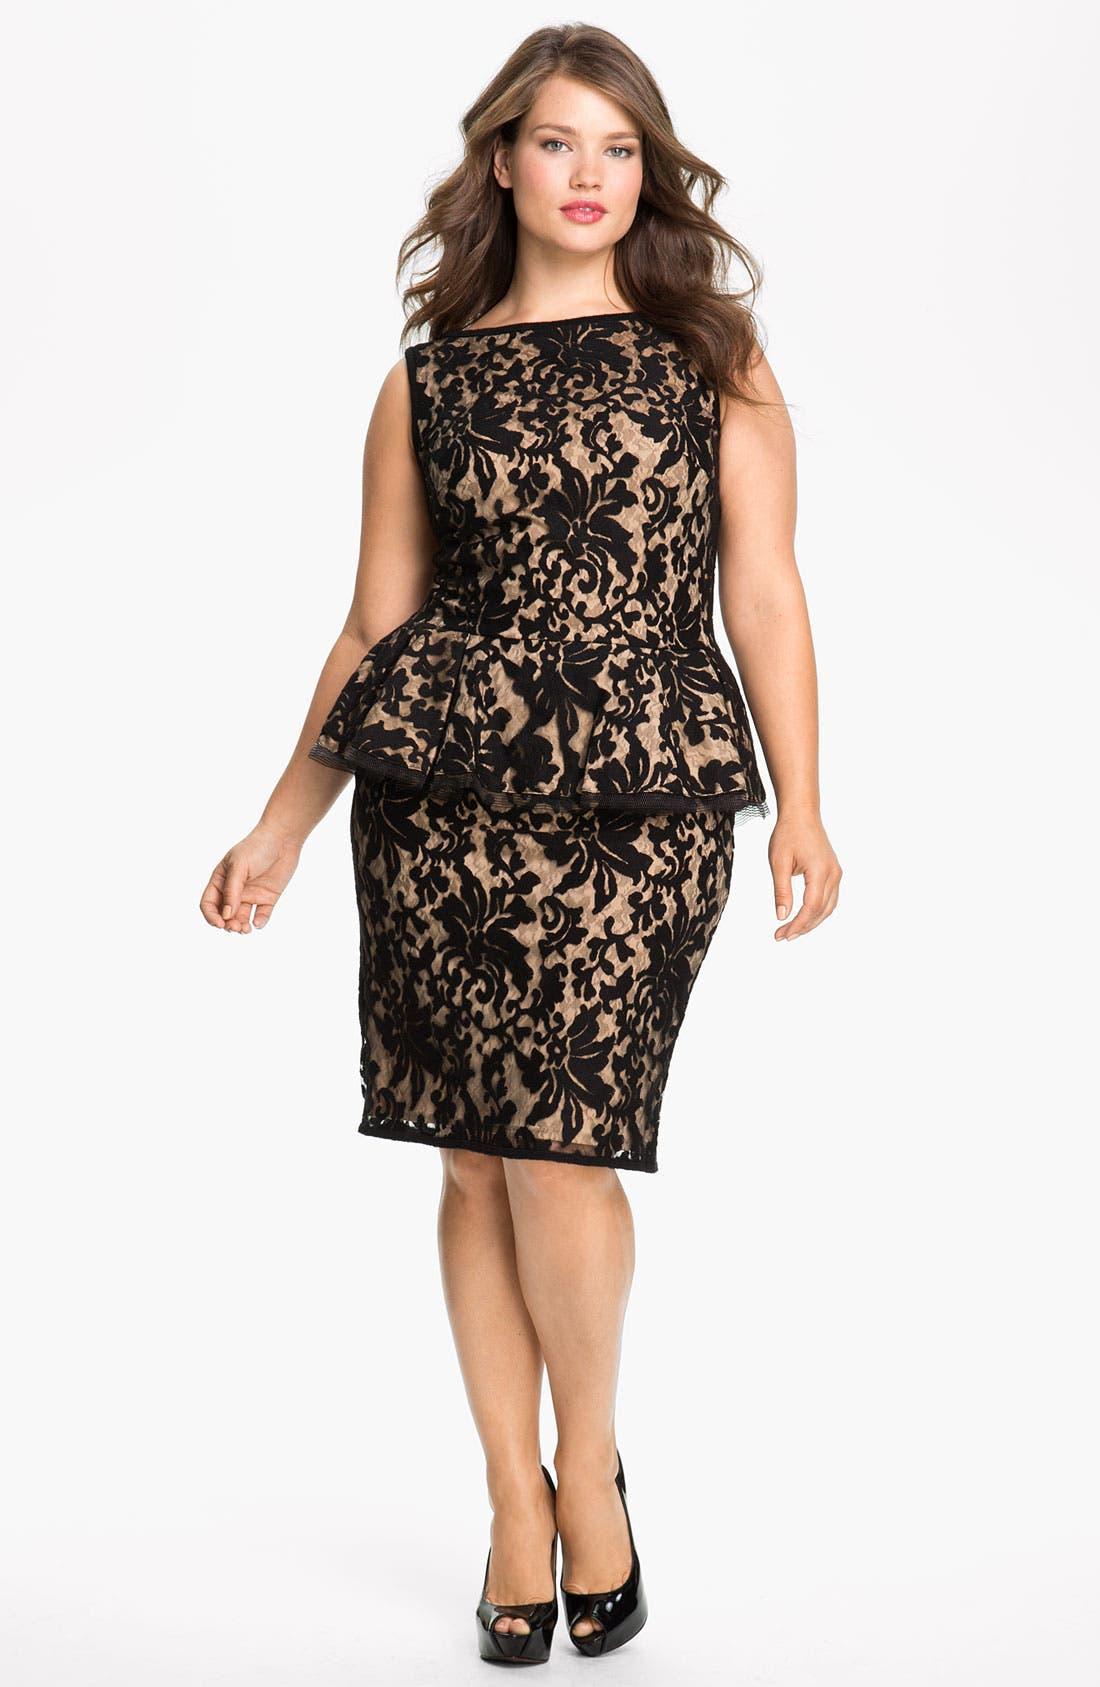 Alternate Image 1 Selected - Tadashi Shoji Lace Peplum Dress (Plus Size)